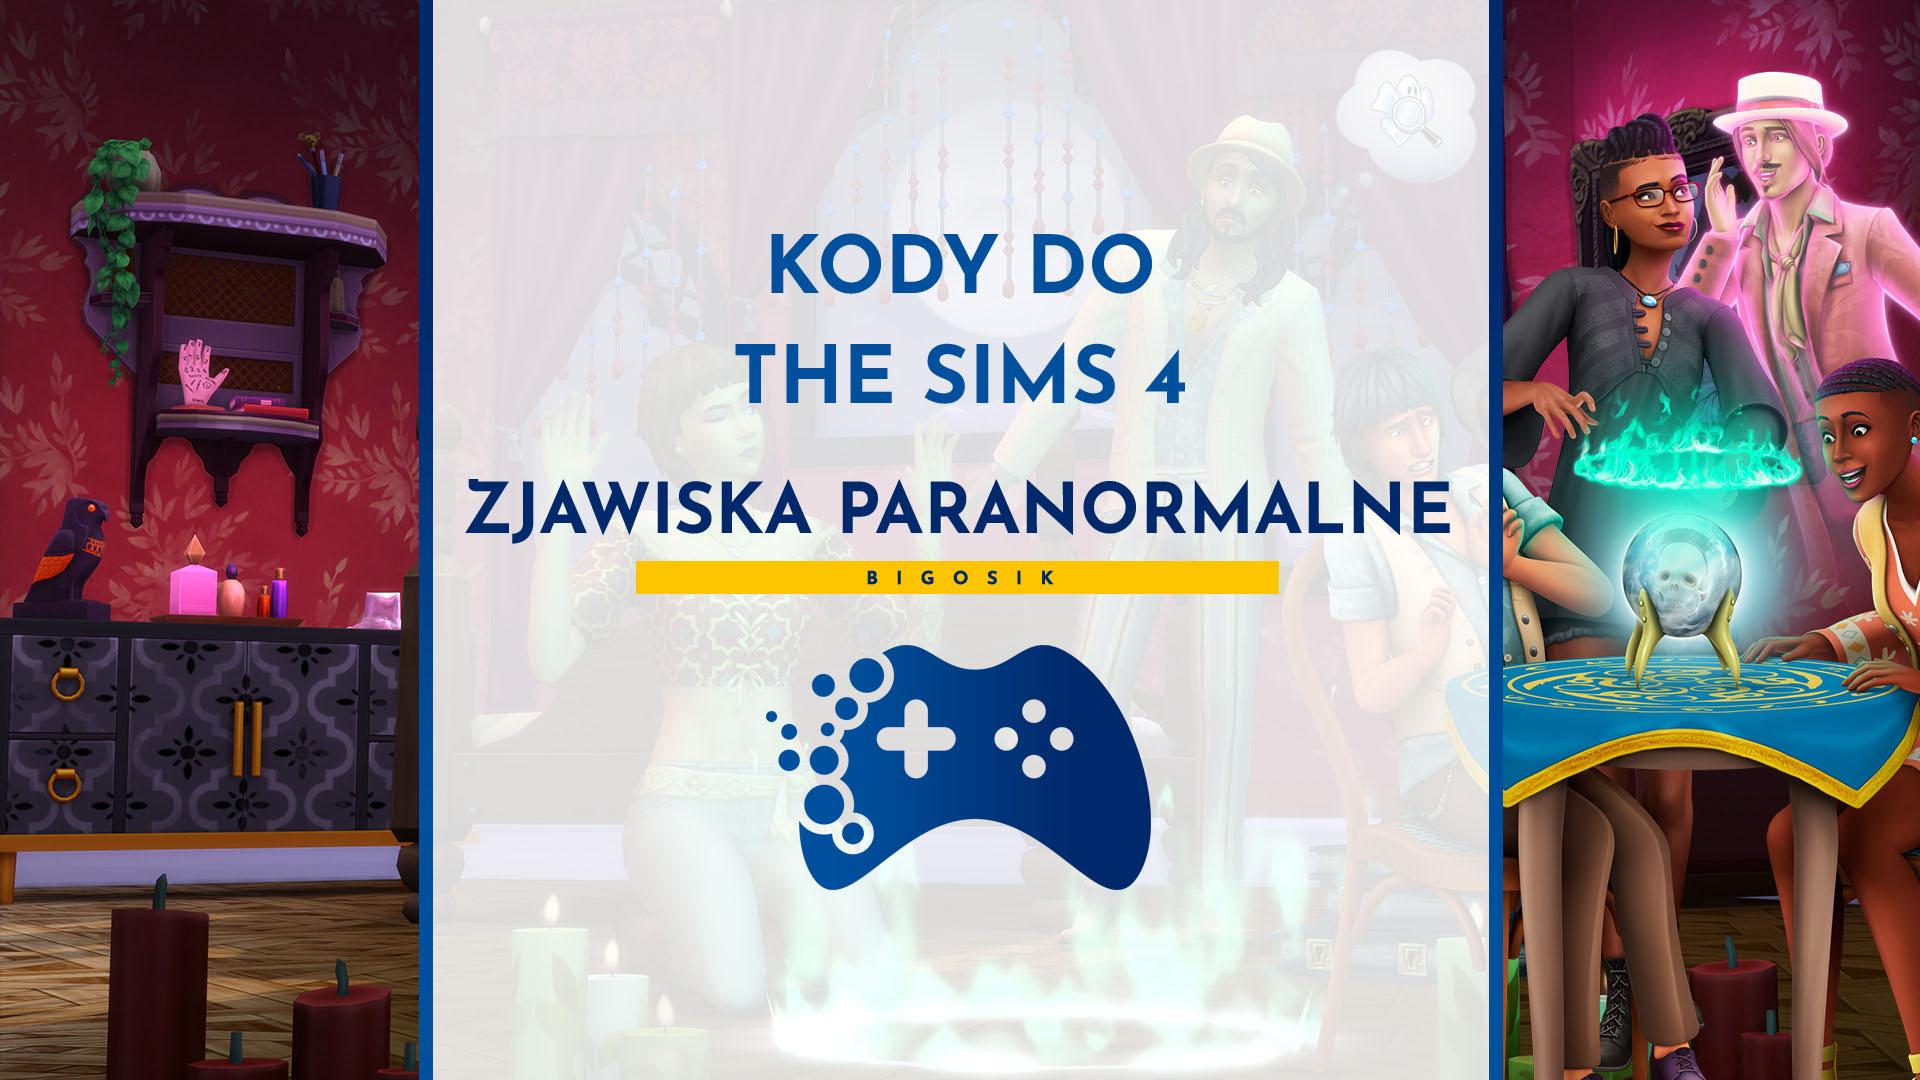 Kody do The Sims 4 Zjawiska paranormalne